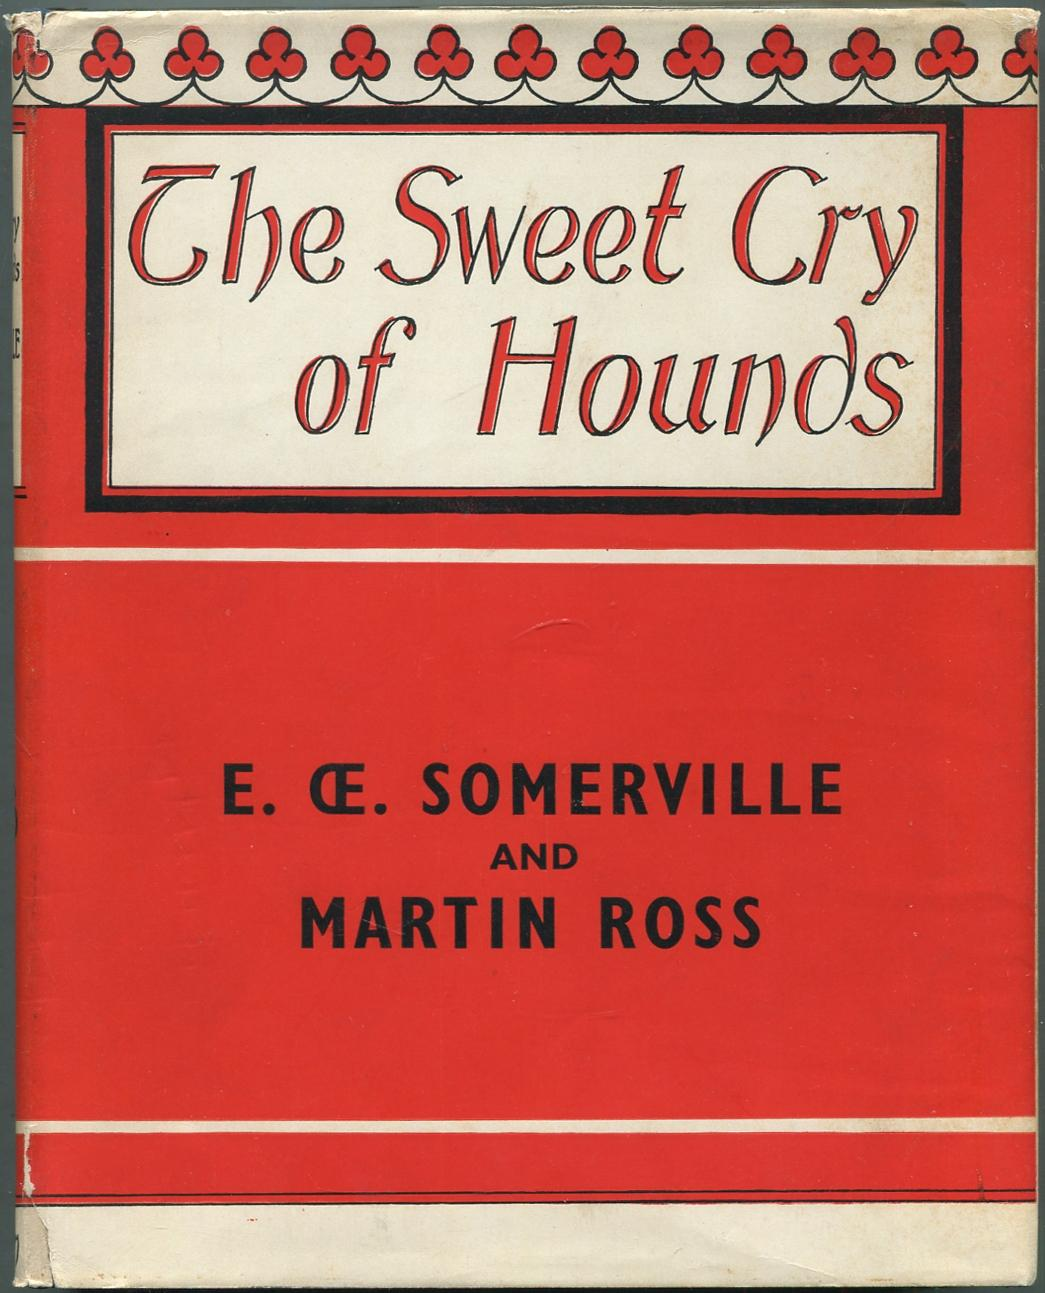 Somerville and Ross (The Irish writers series) by John Cronin